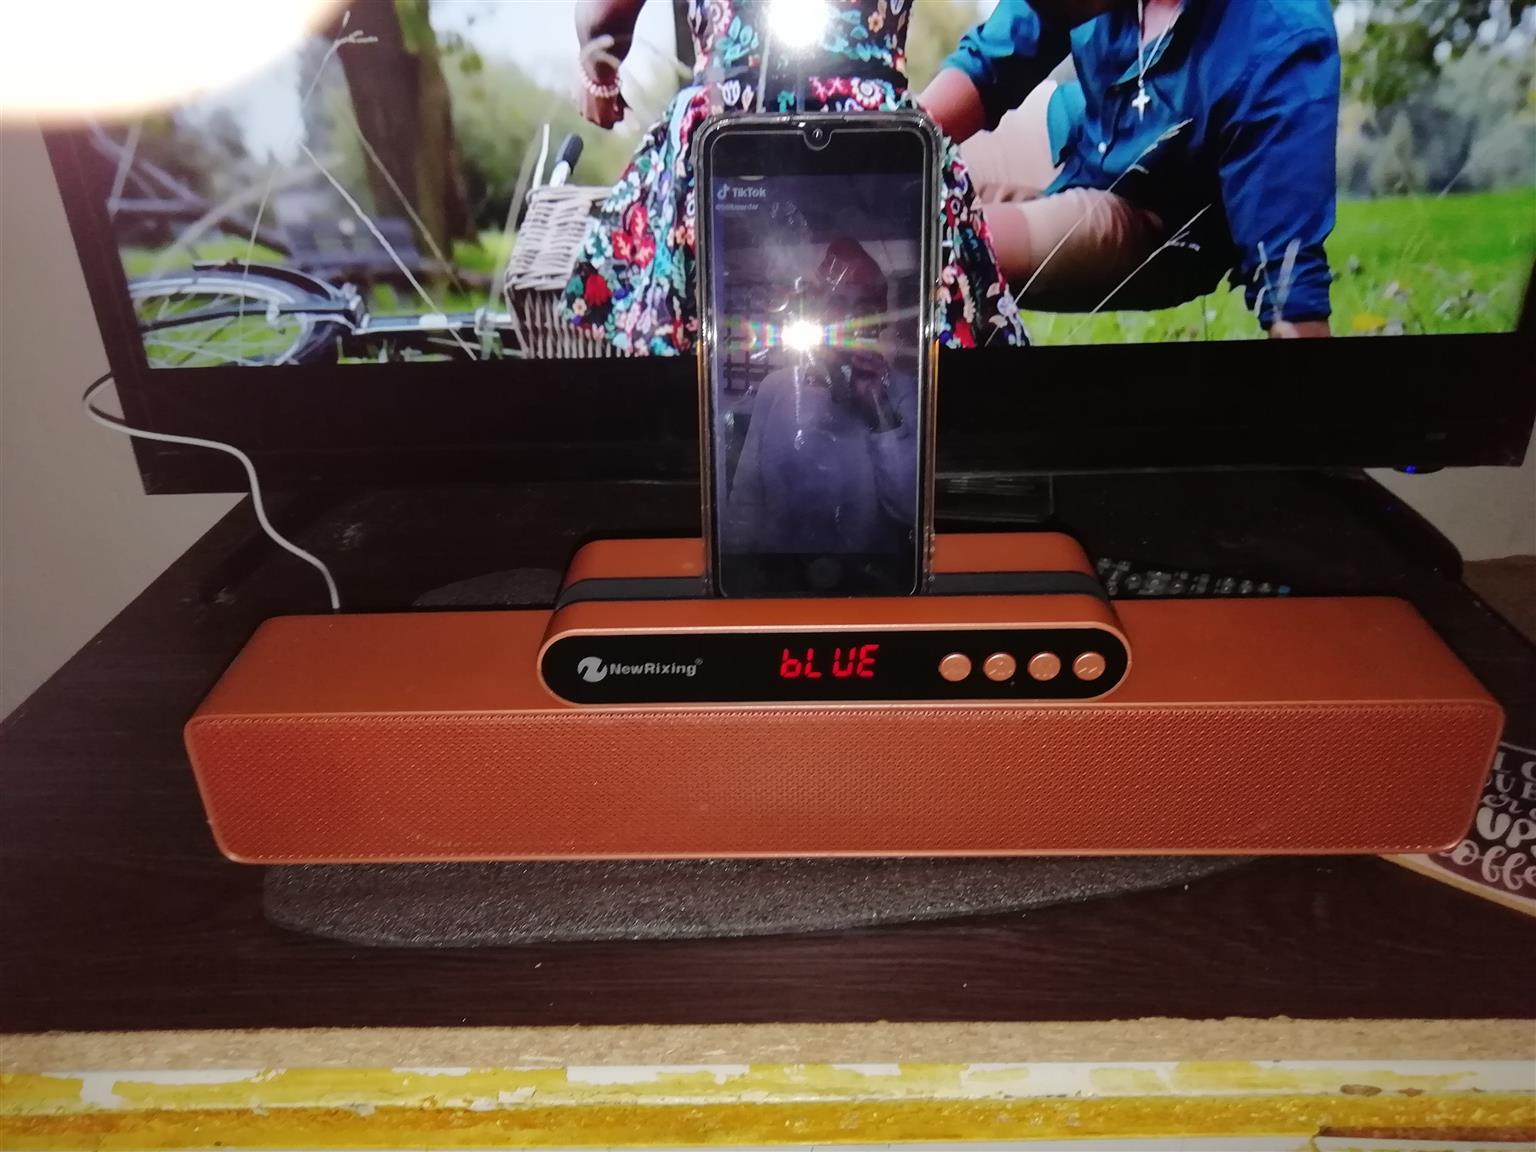 New rixing nr-5017 bluetooth 3d wireless Bluetooth SOUNDBAR speaker brand new in box never used!